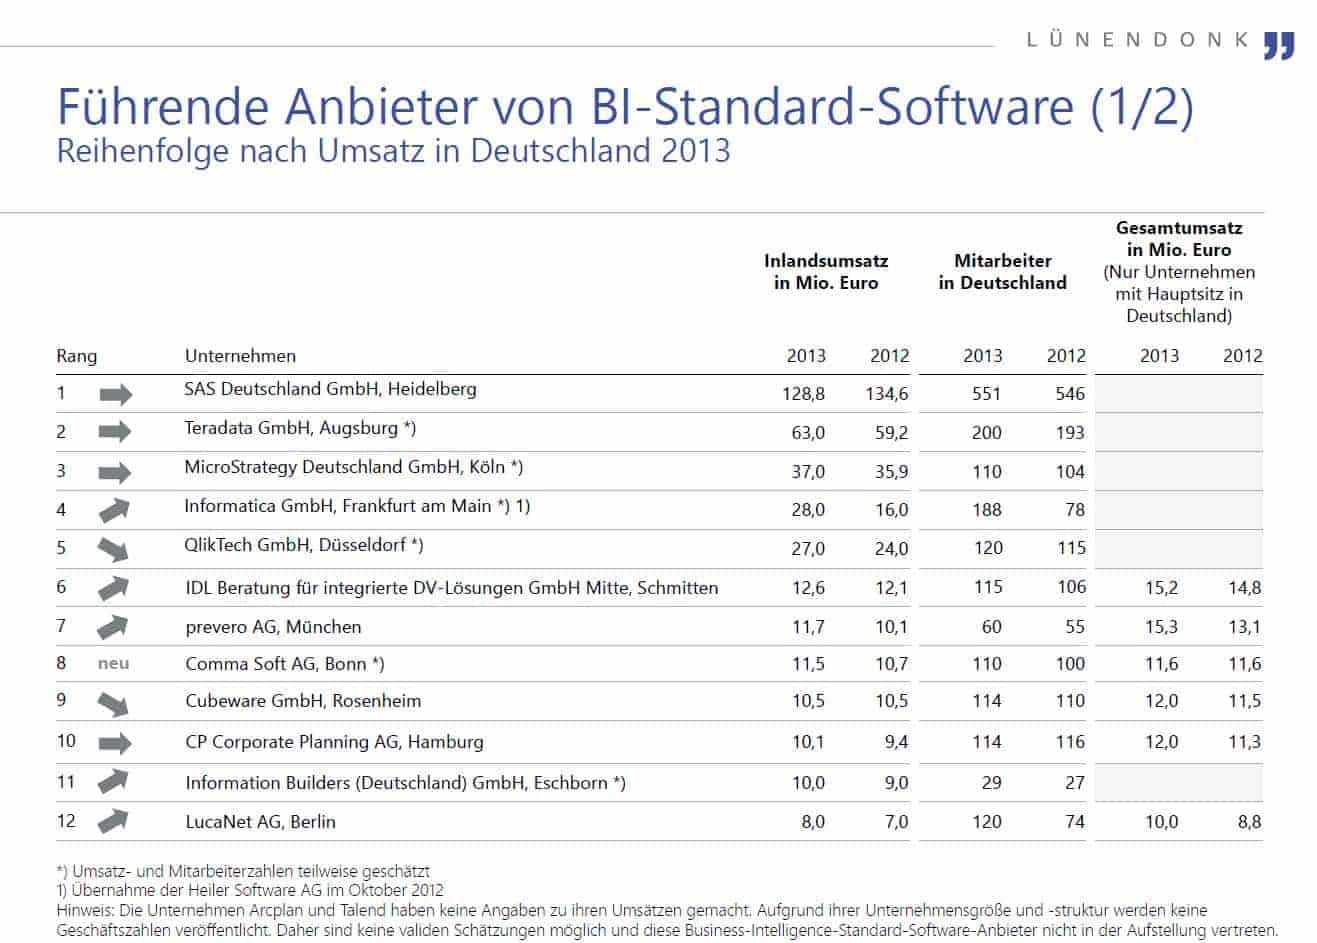 Lünendonk‐Marktstichprobe 2014 Business‐Intelligence‐Standard‐Software. Bild: Lünendonk